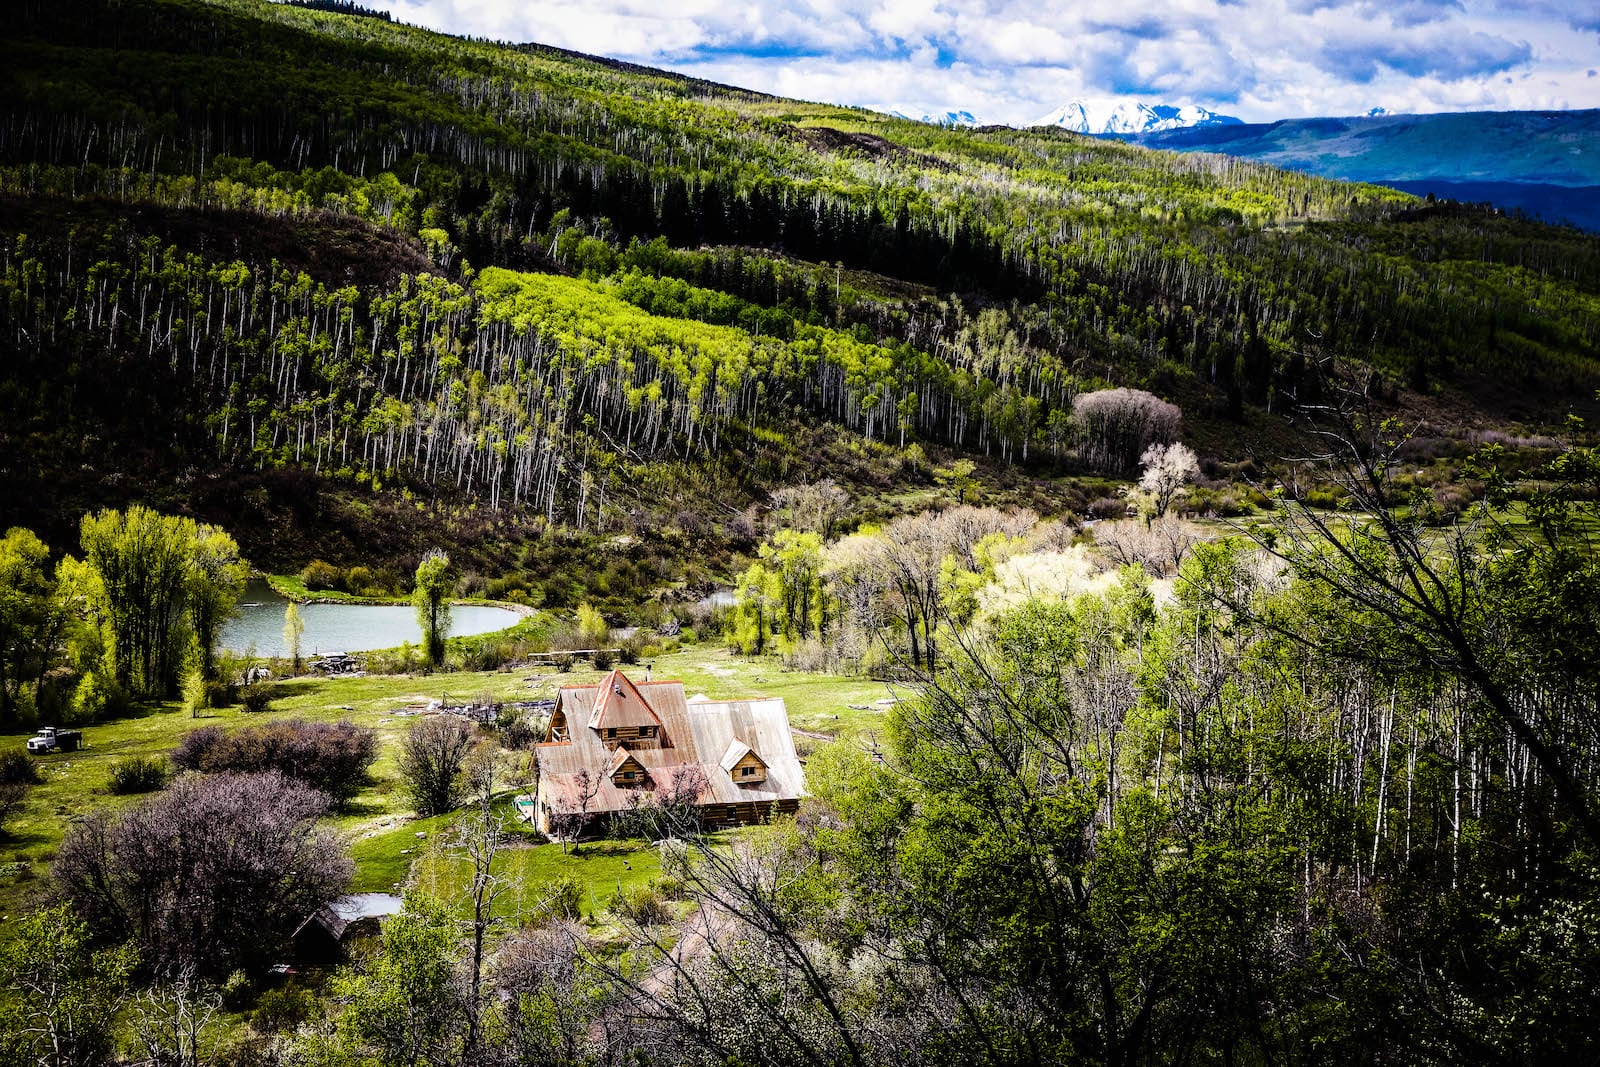 McClure Pass Colorado Sheep Farm